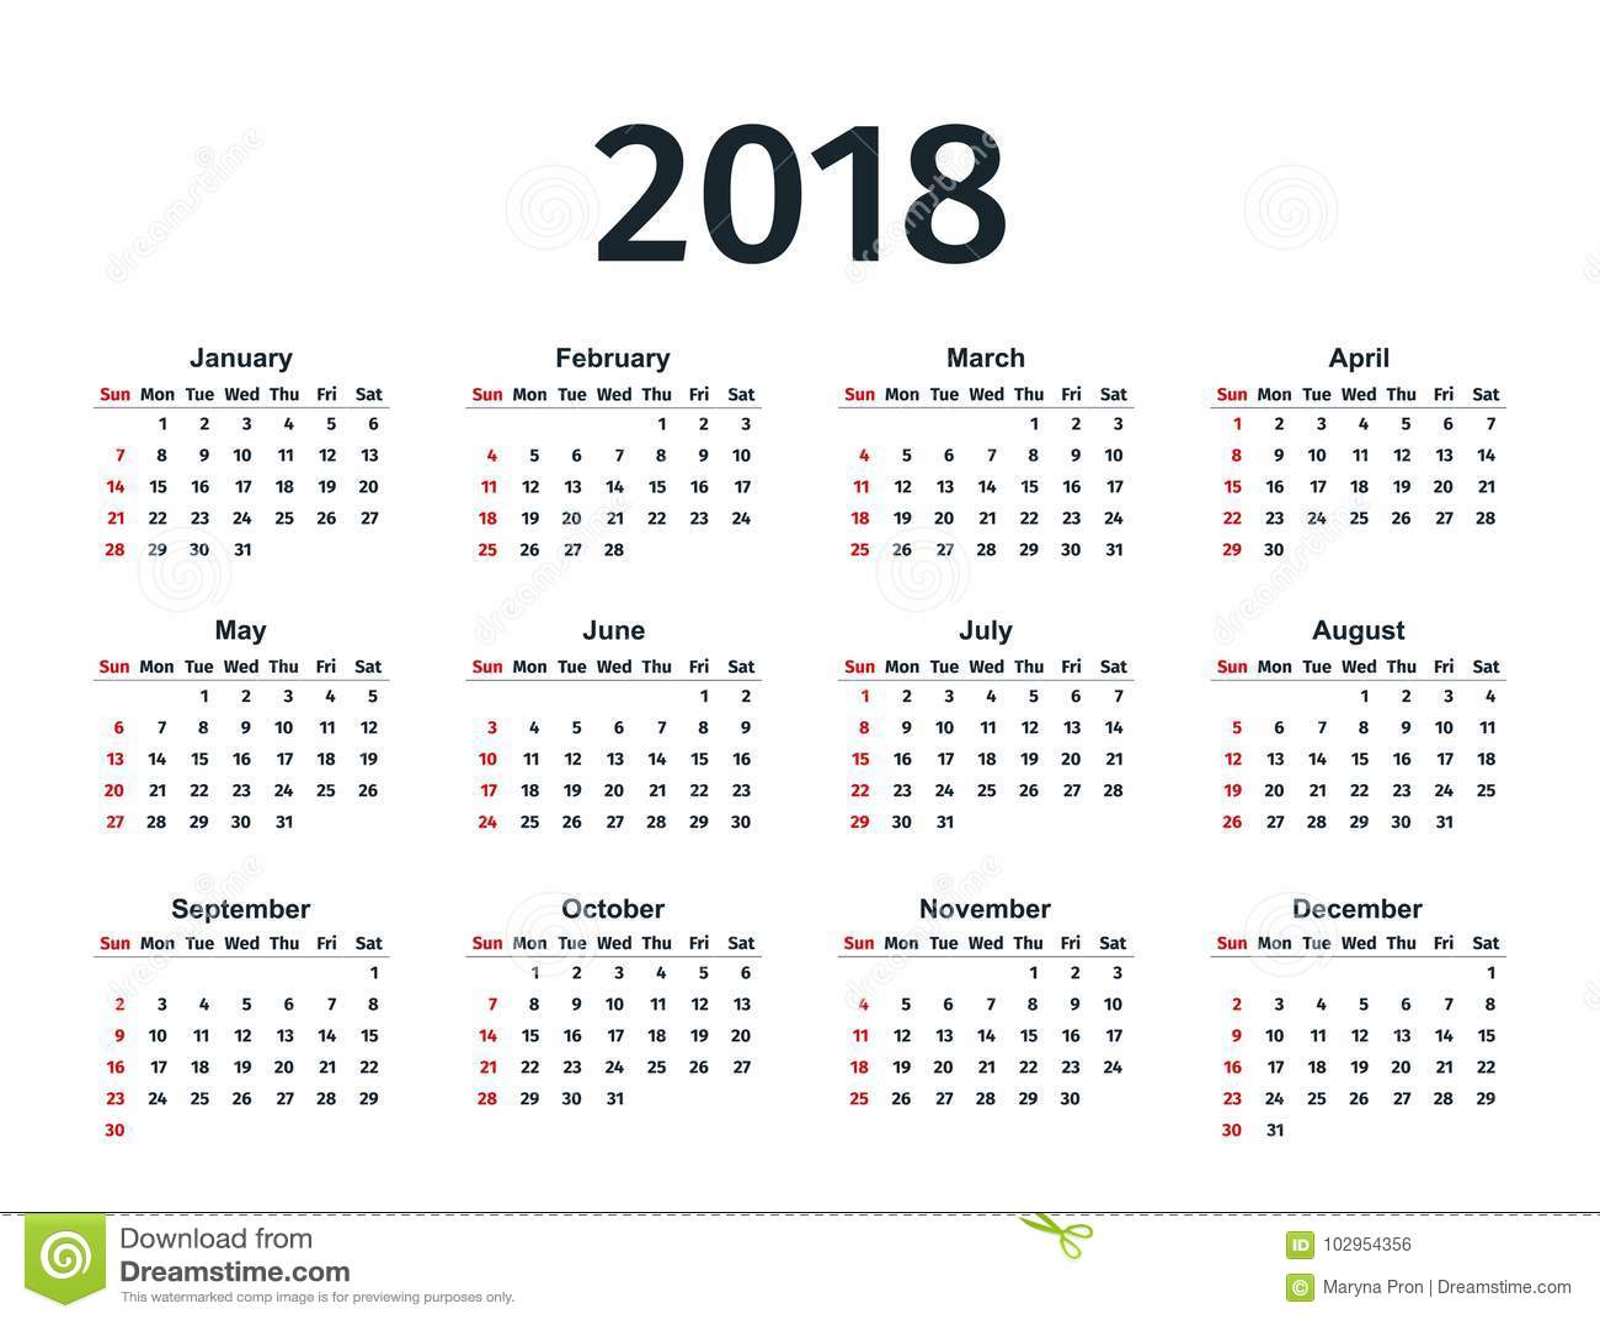 Calendar Planner Vector Free : Calendar year vector template planner stock